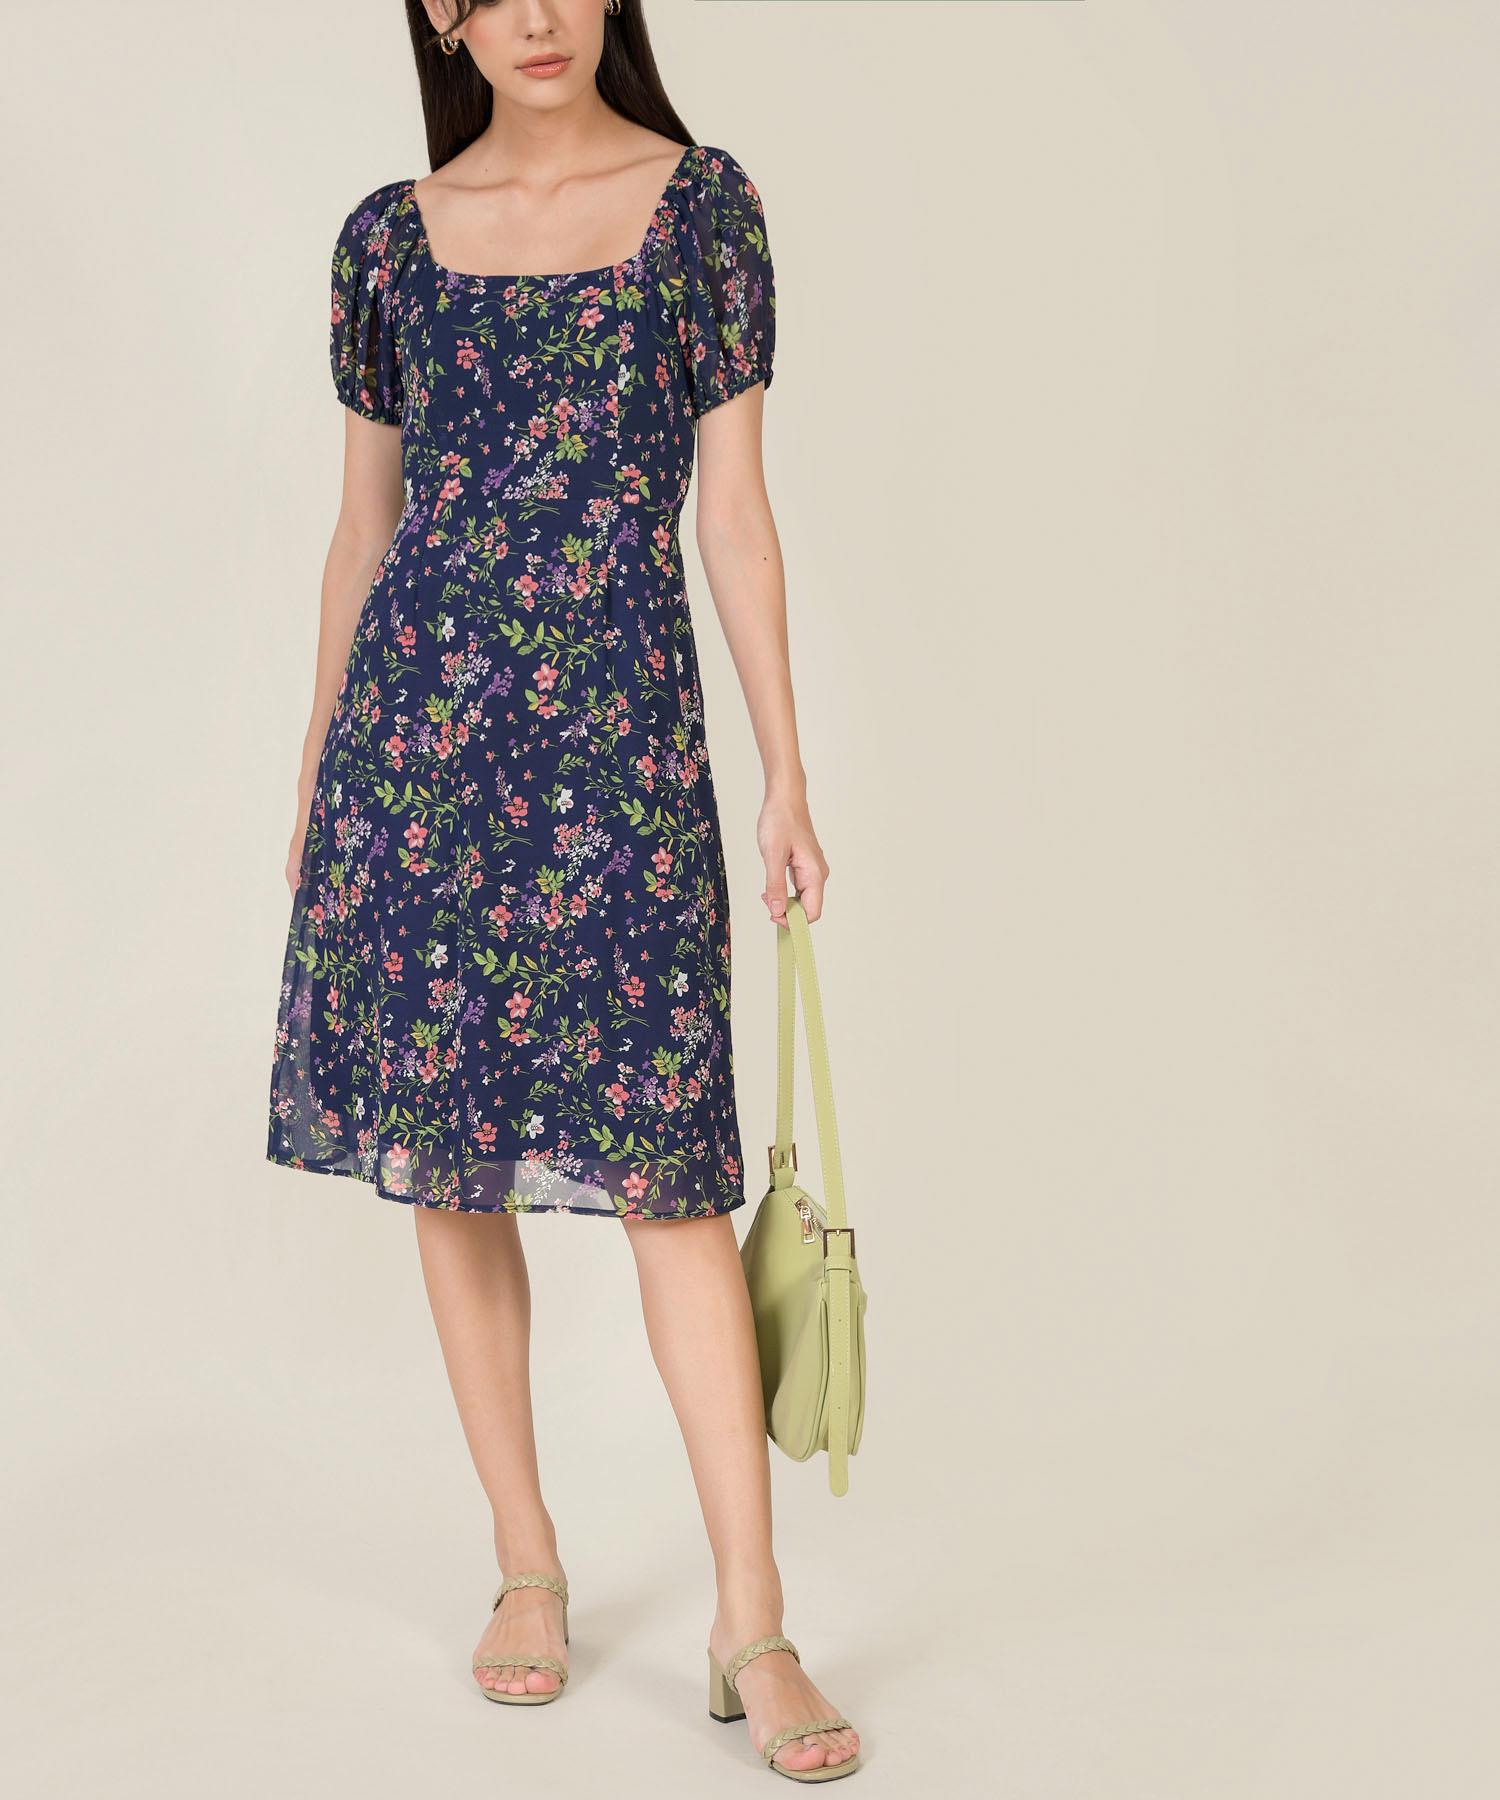 margaux-floral-midi-dress-navy-1